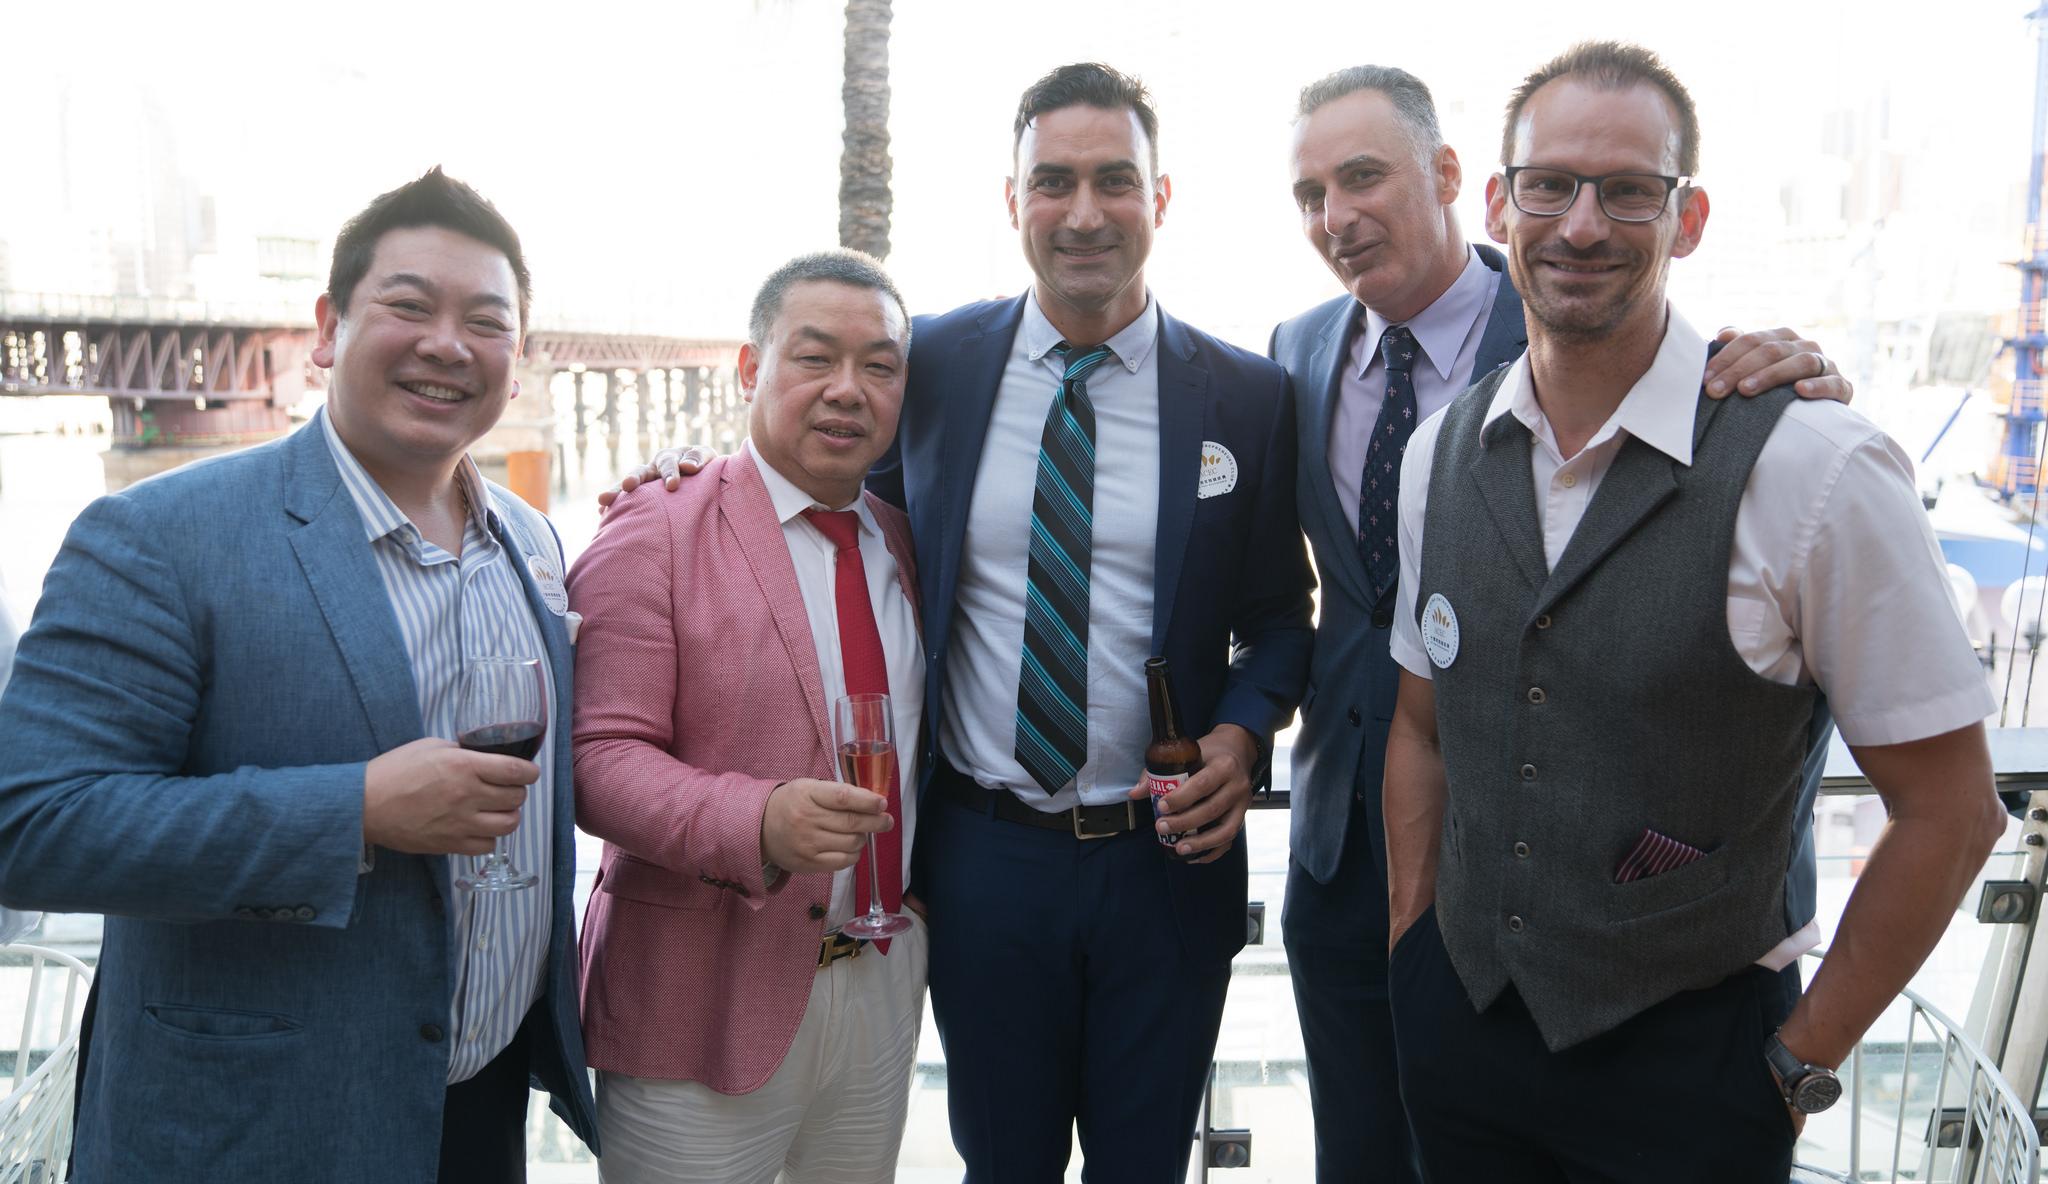 Australia China Entrepreneurs Club 10 Year Anniversary Celebration (12/10/2017)